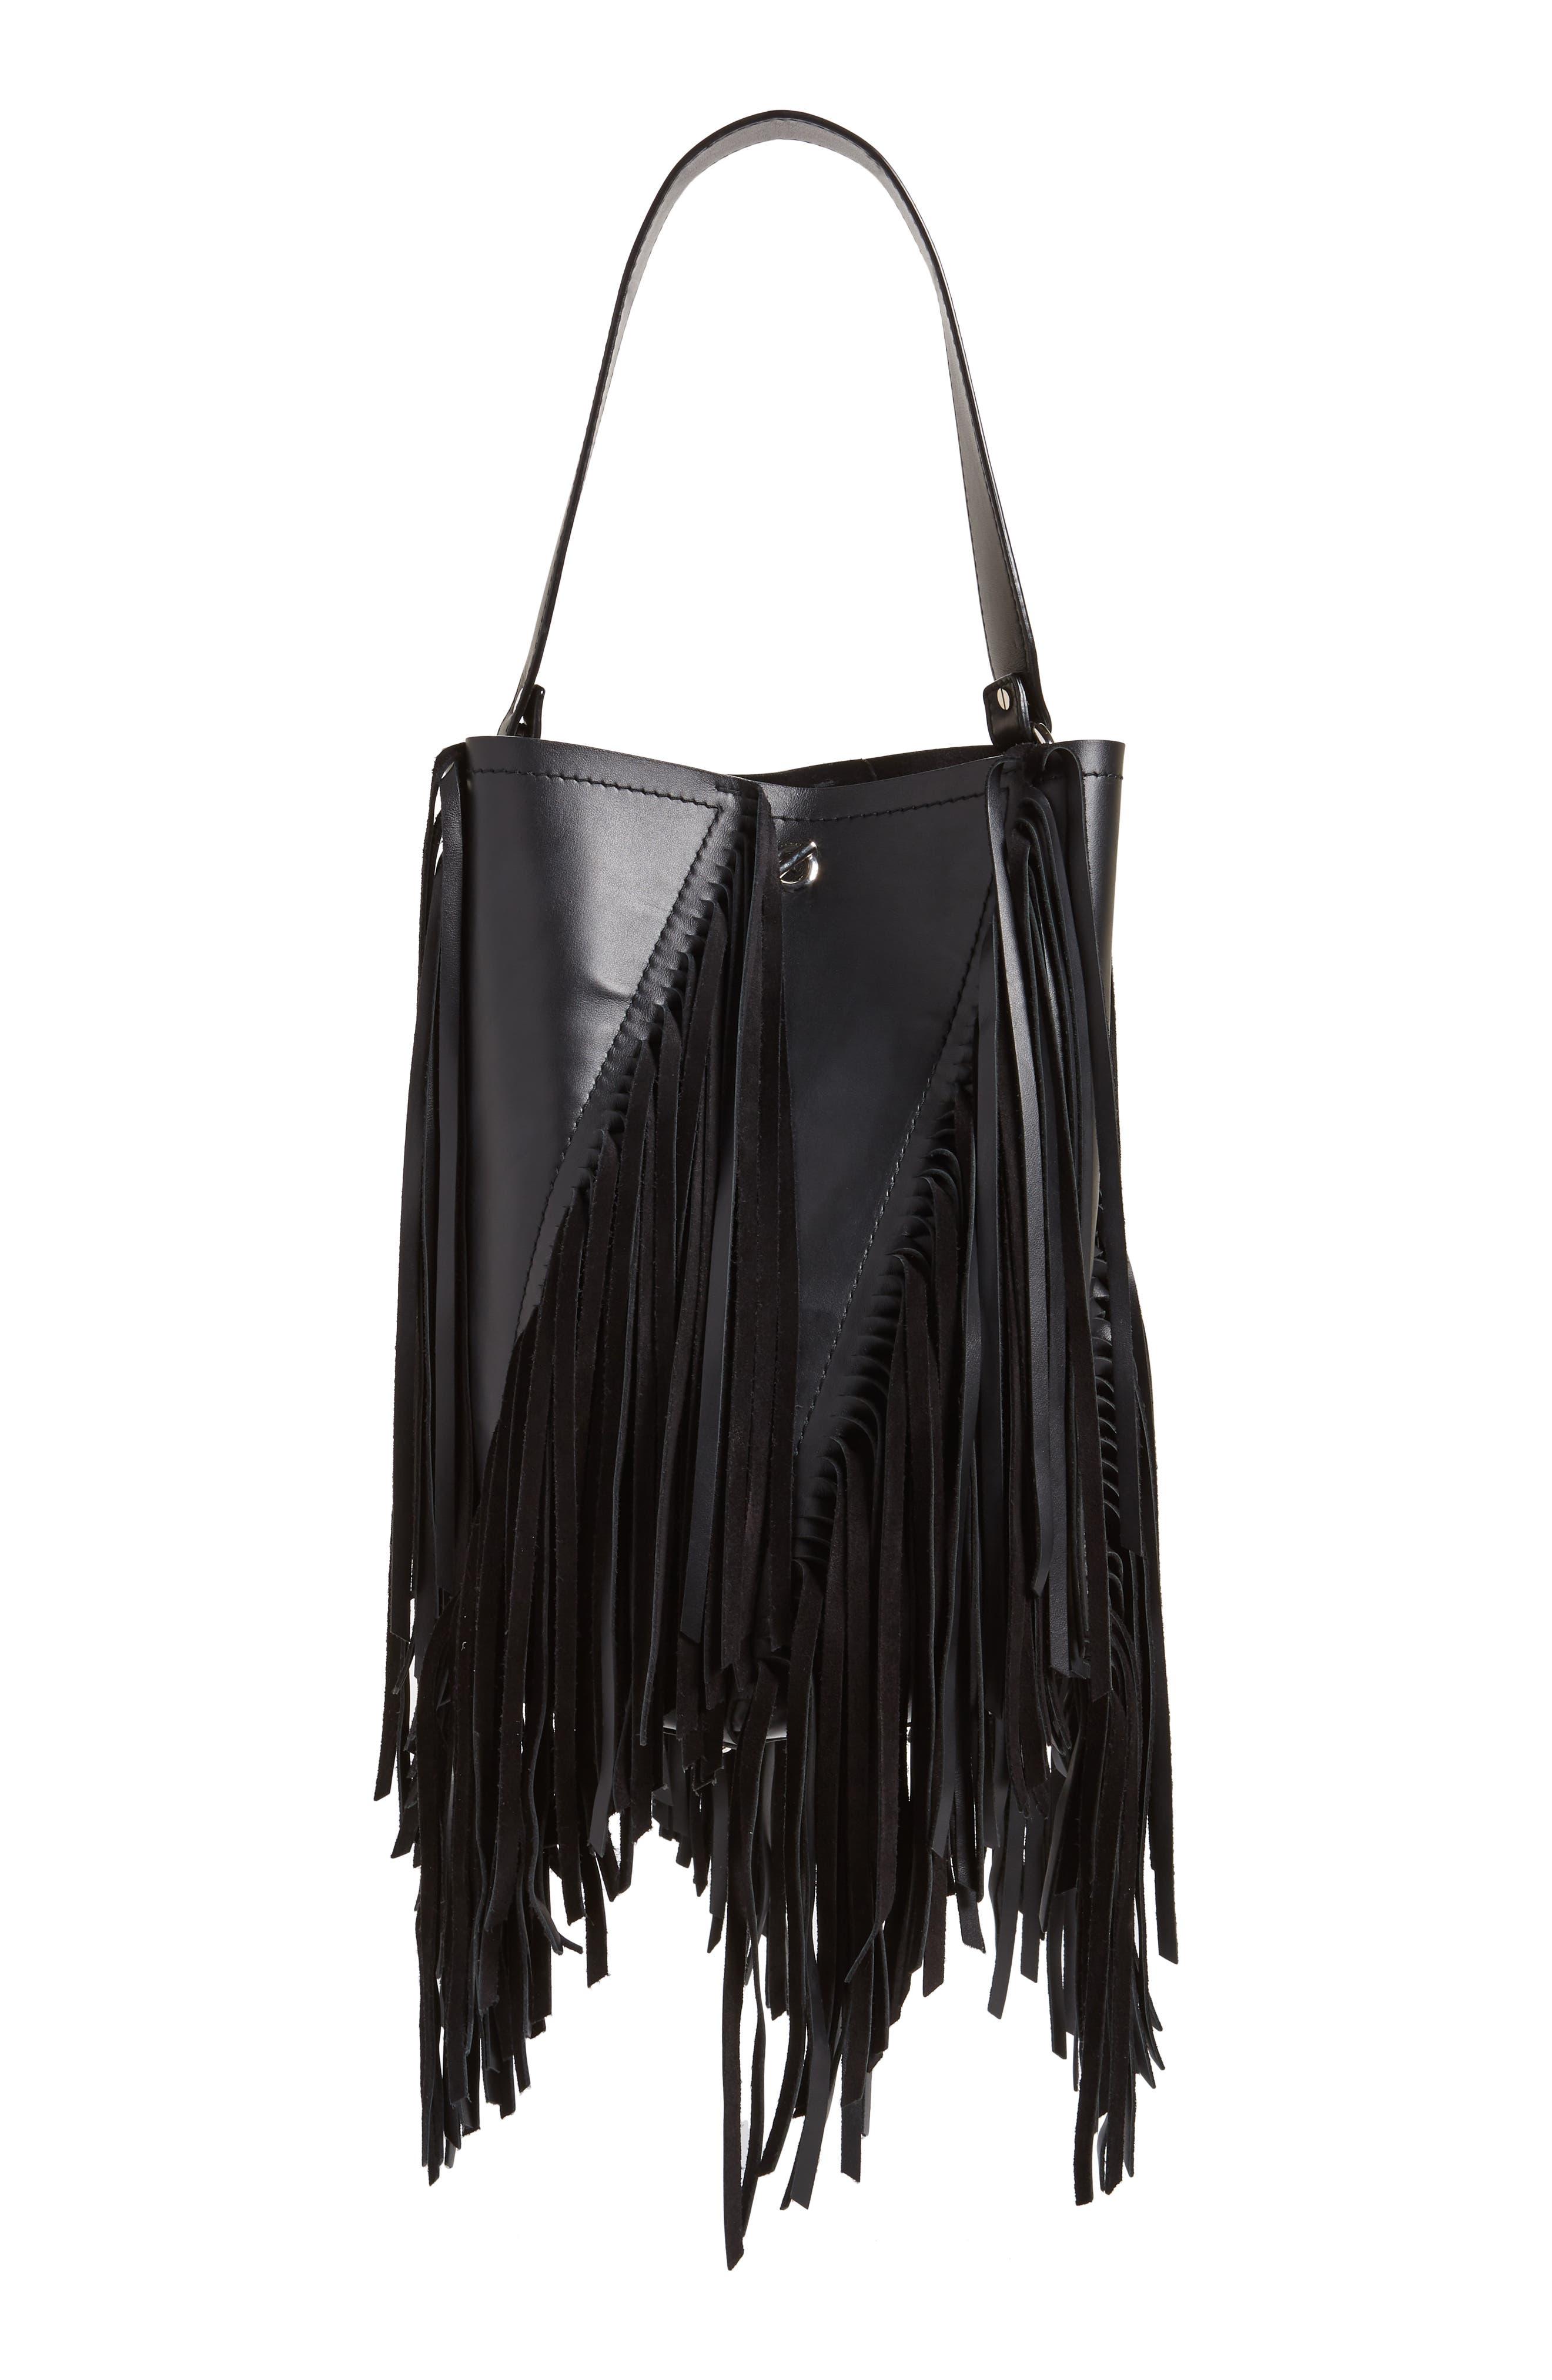 PROENZA SCHOULER, Medium Hex Fringe Calfskin Leather Bucket Bag, Main thumbnail 1, color, BLACK/ BLACK